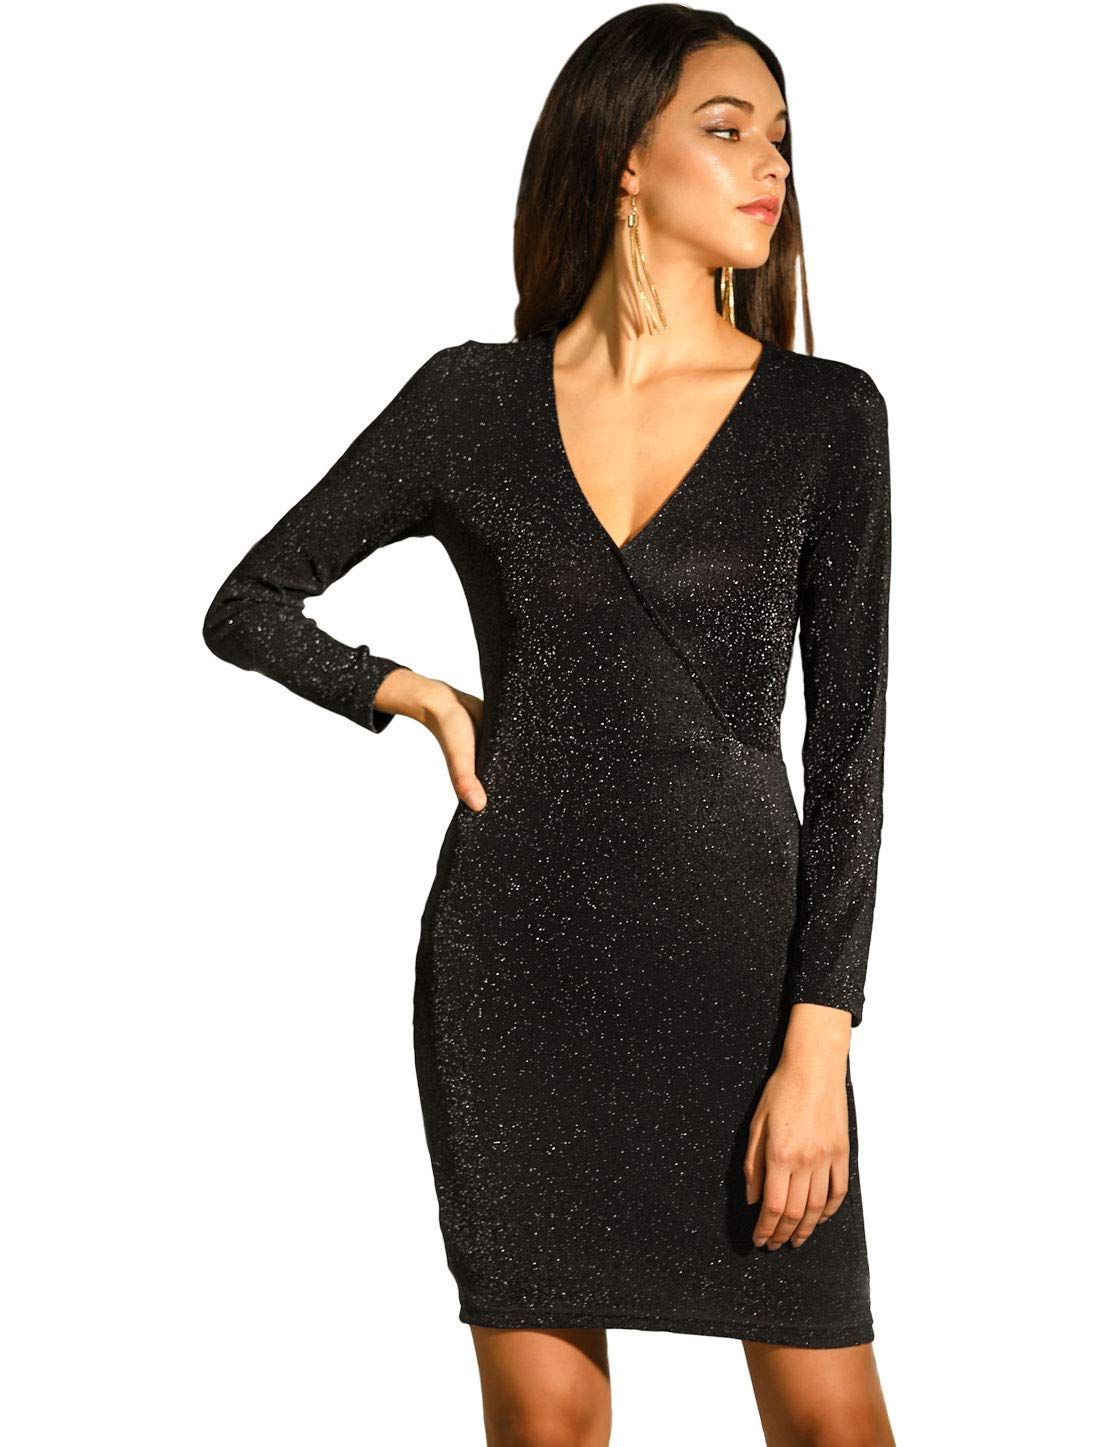 Allegra K Women's V Neck Long Sleeve Stretchy Sparkle Glitter Bodycon Dress